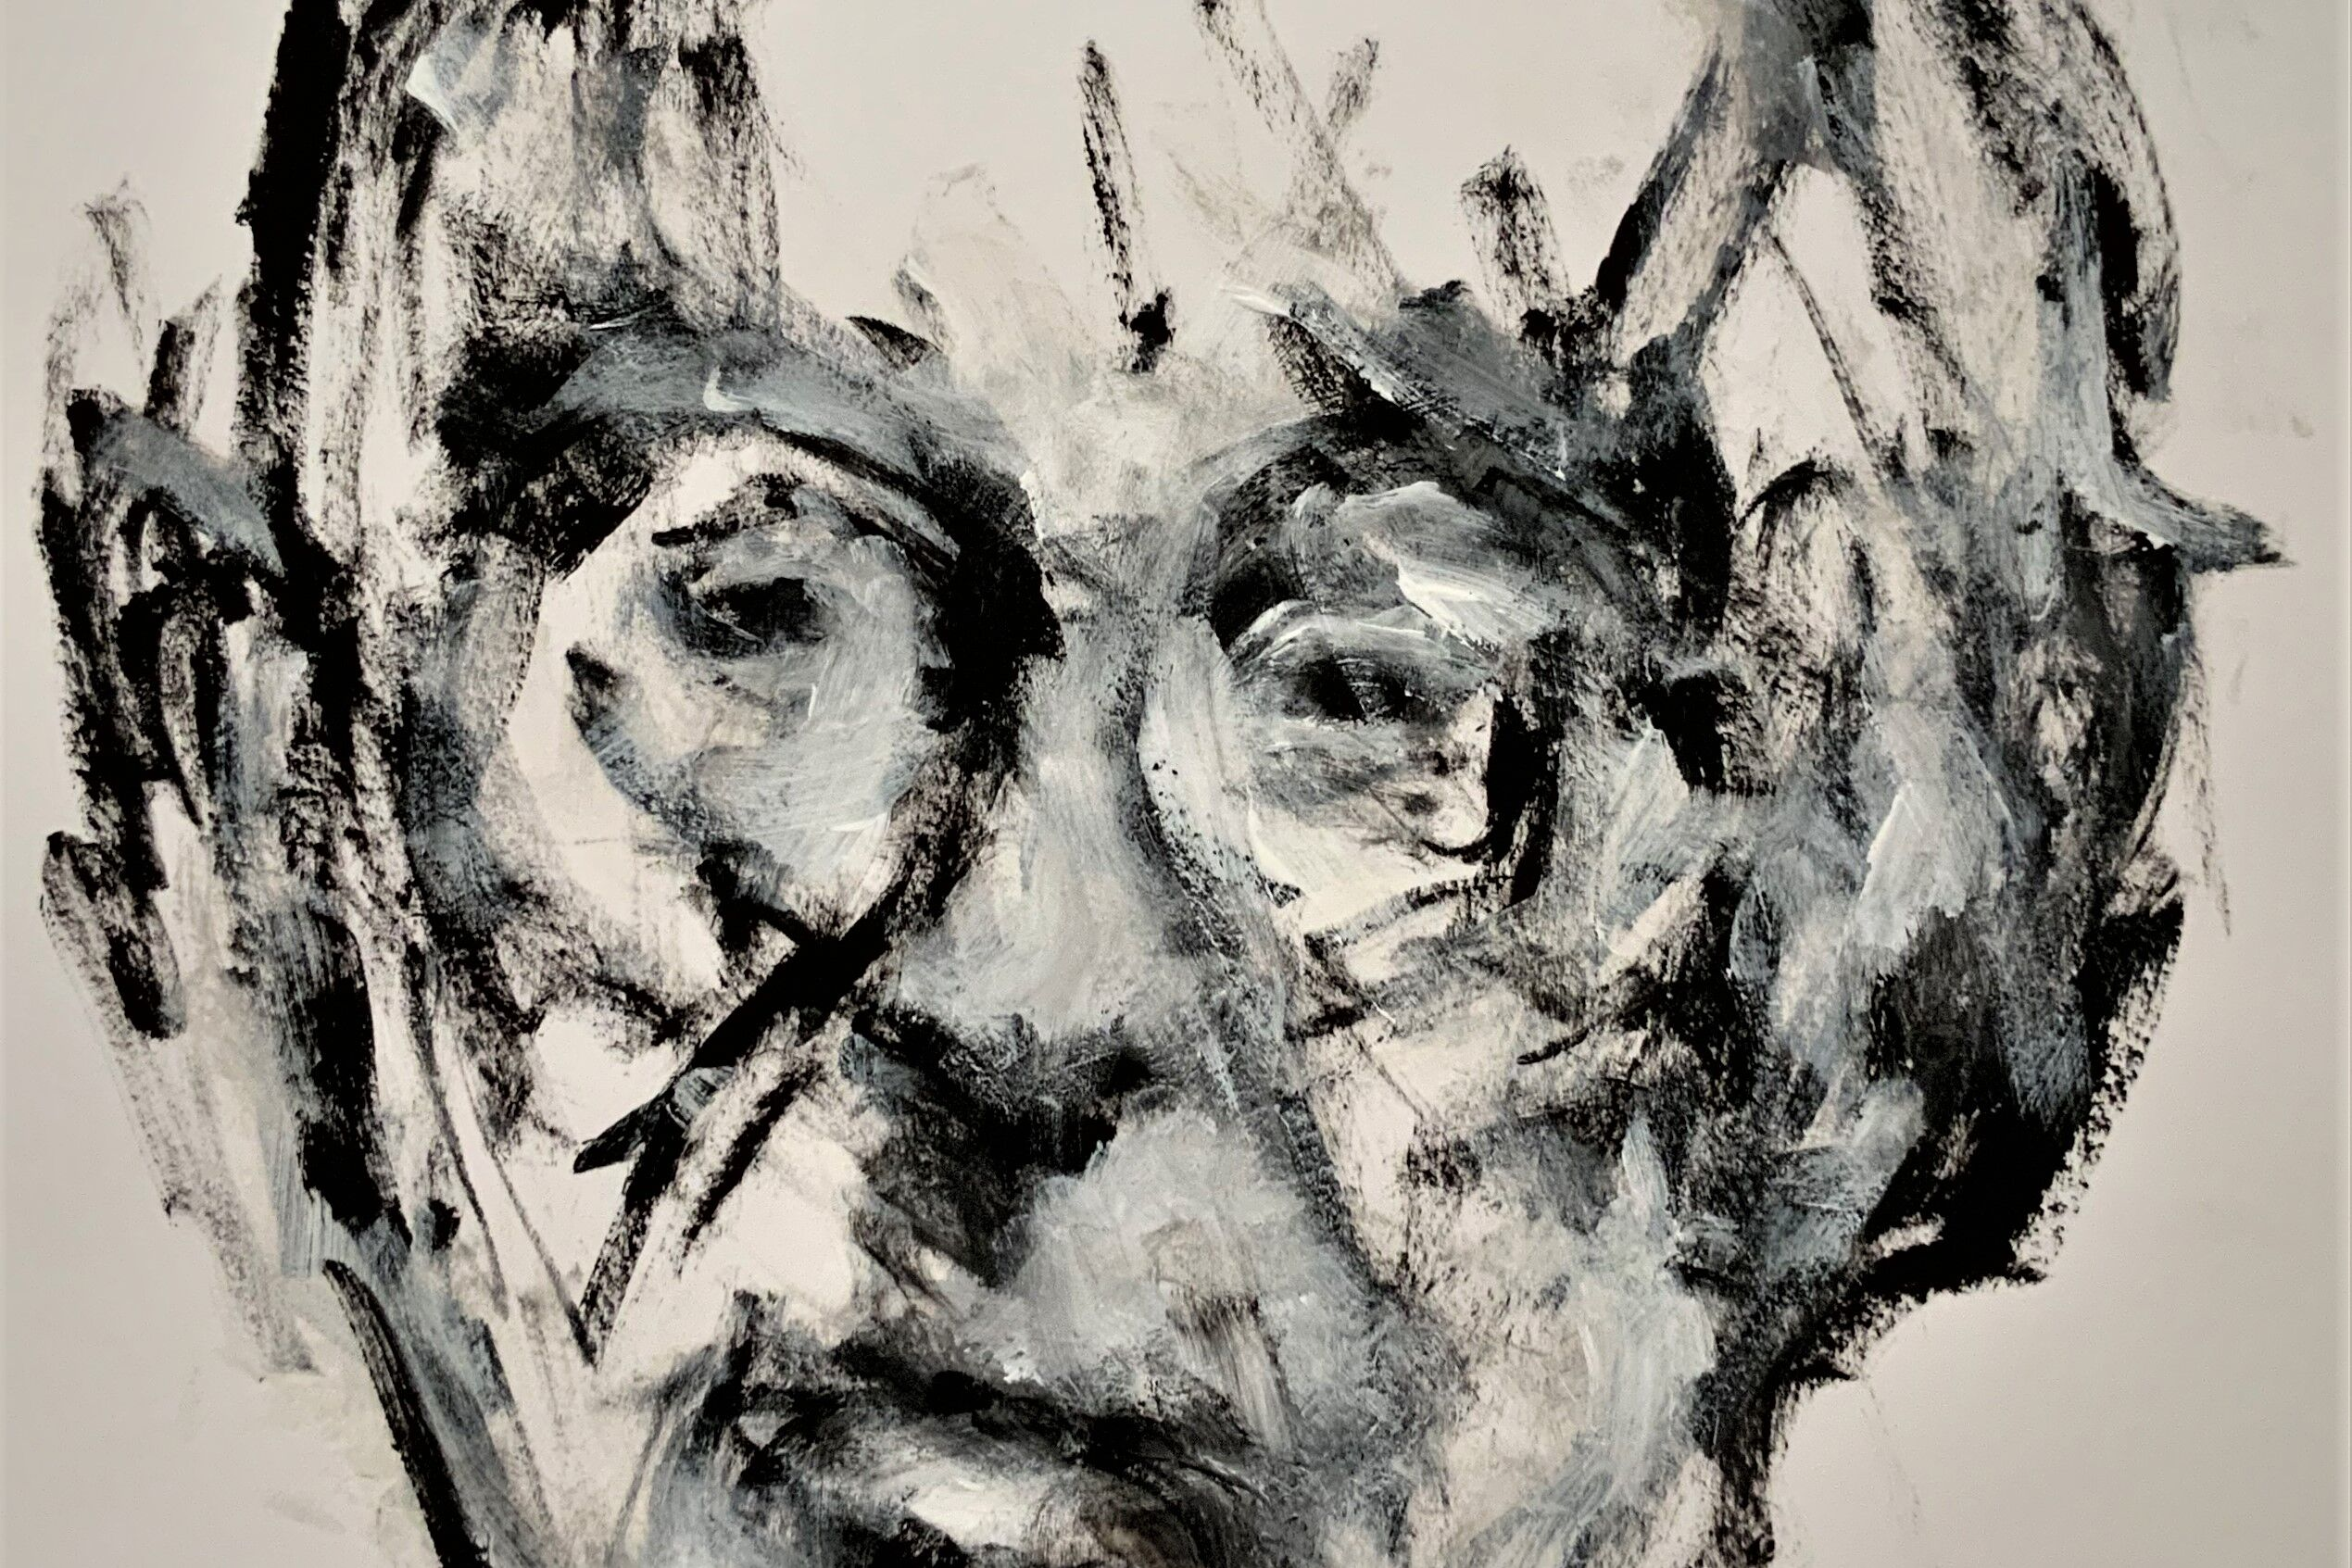 Joseph%20Luczynski%202020_Title%20Self-Portrait%20Artist